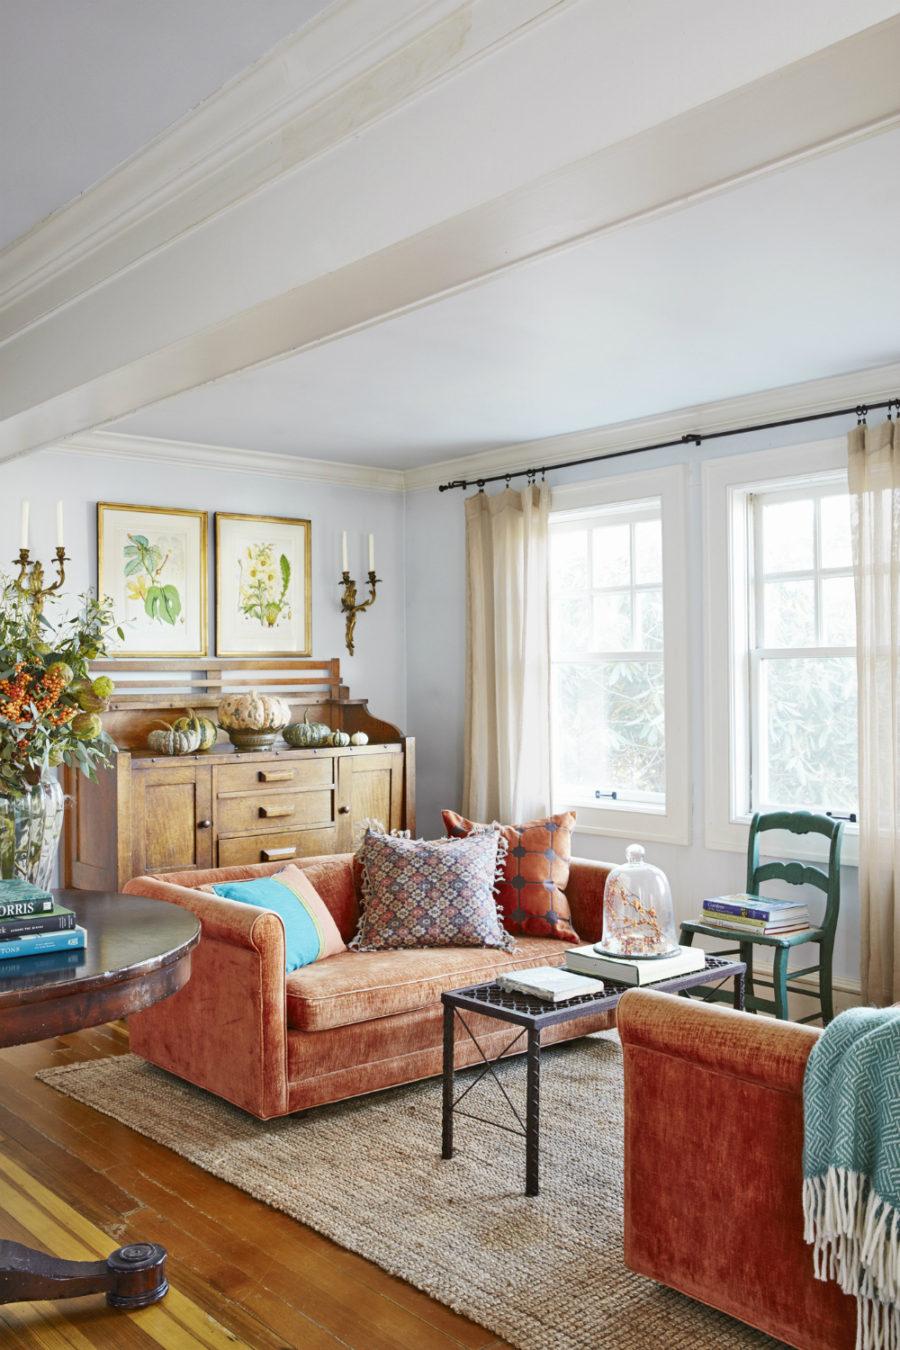 deep sofa couch bench seat cushion 'tis autumn: living room fall decor ideas